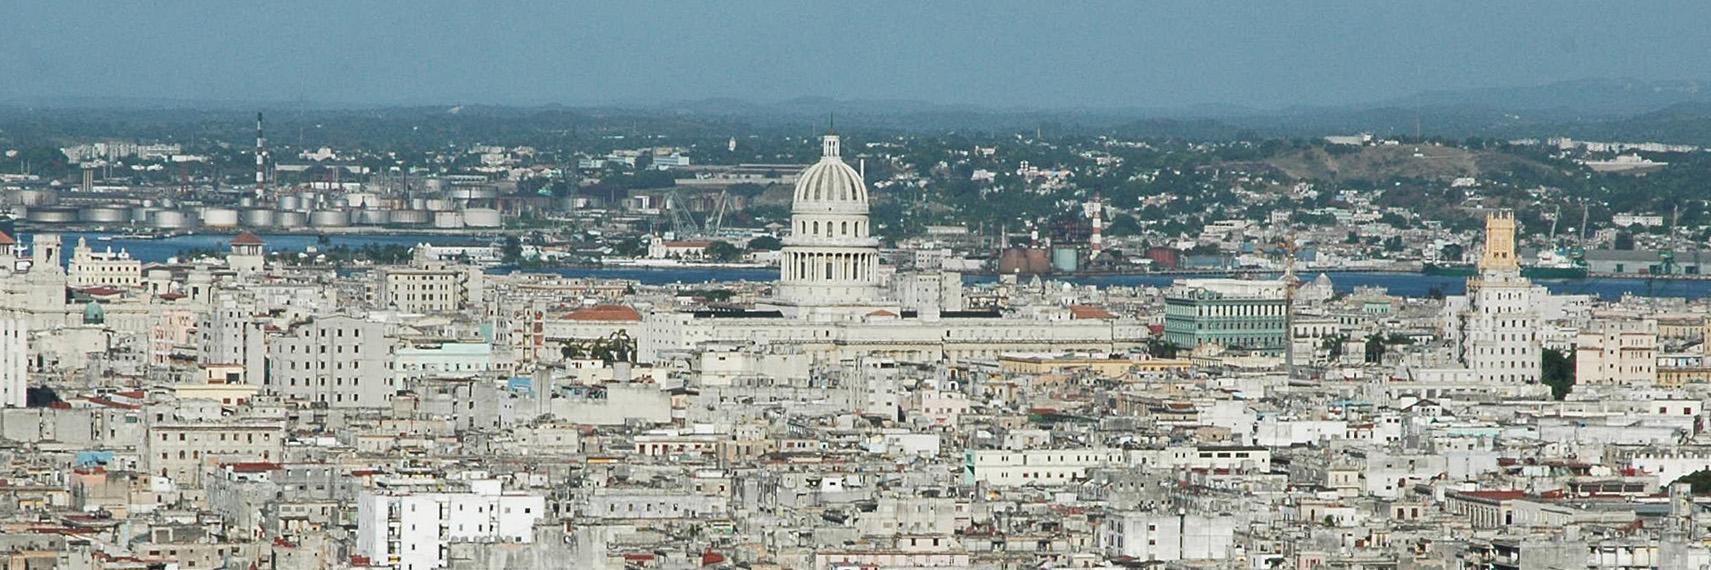 panorama of cuba